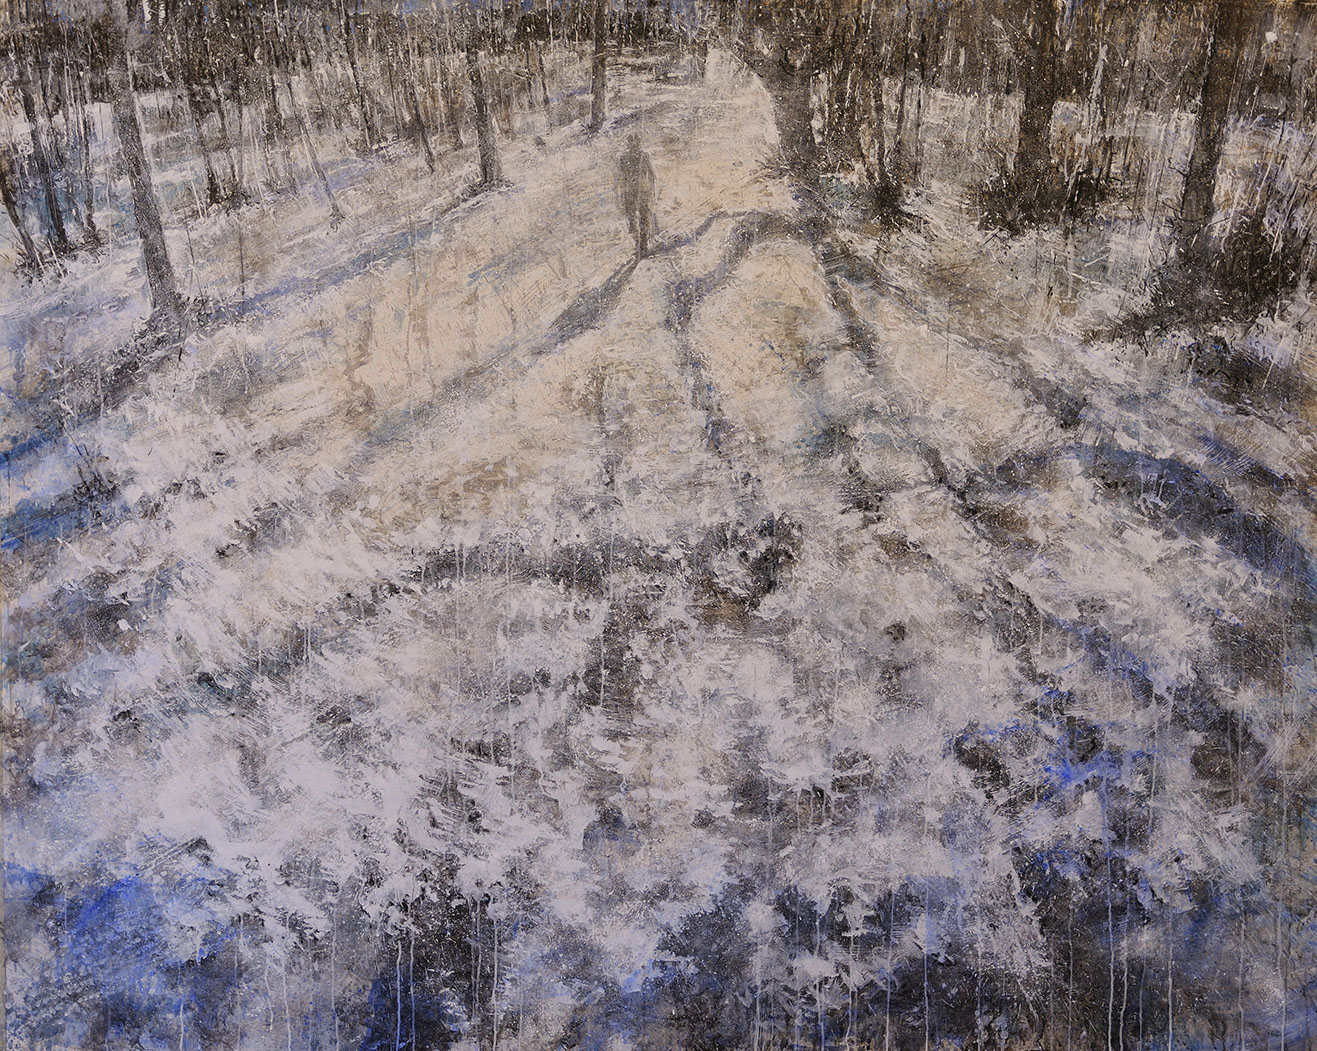 #1 Winterreise - 2020 grafite, fusaggine, pigmento, acrilico,olio, su carta 150x200